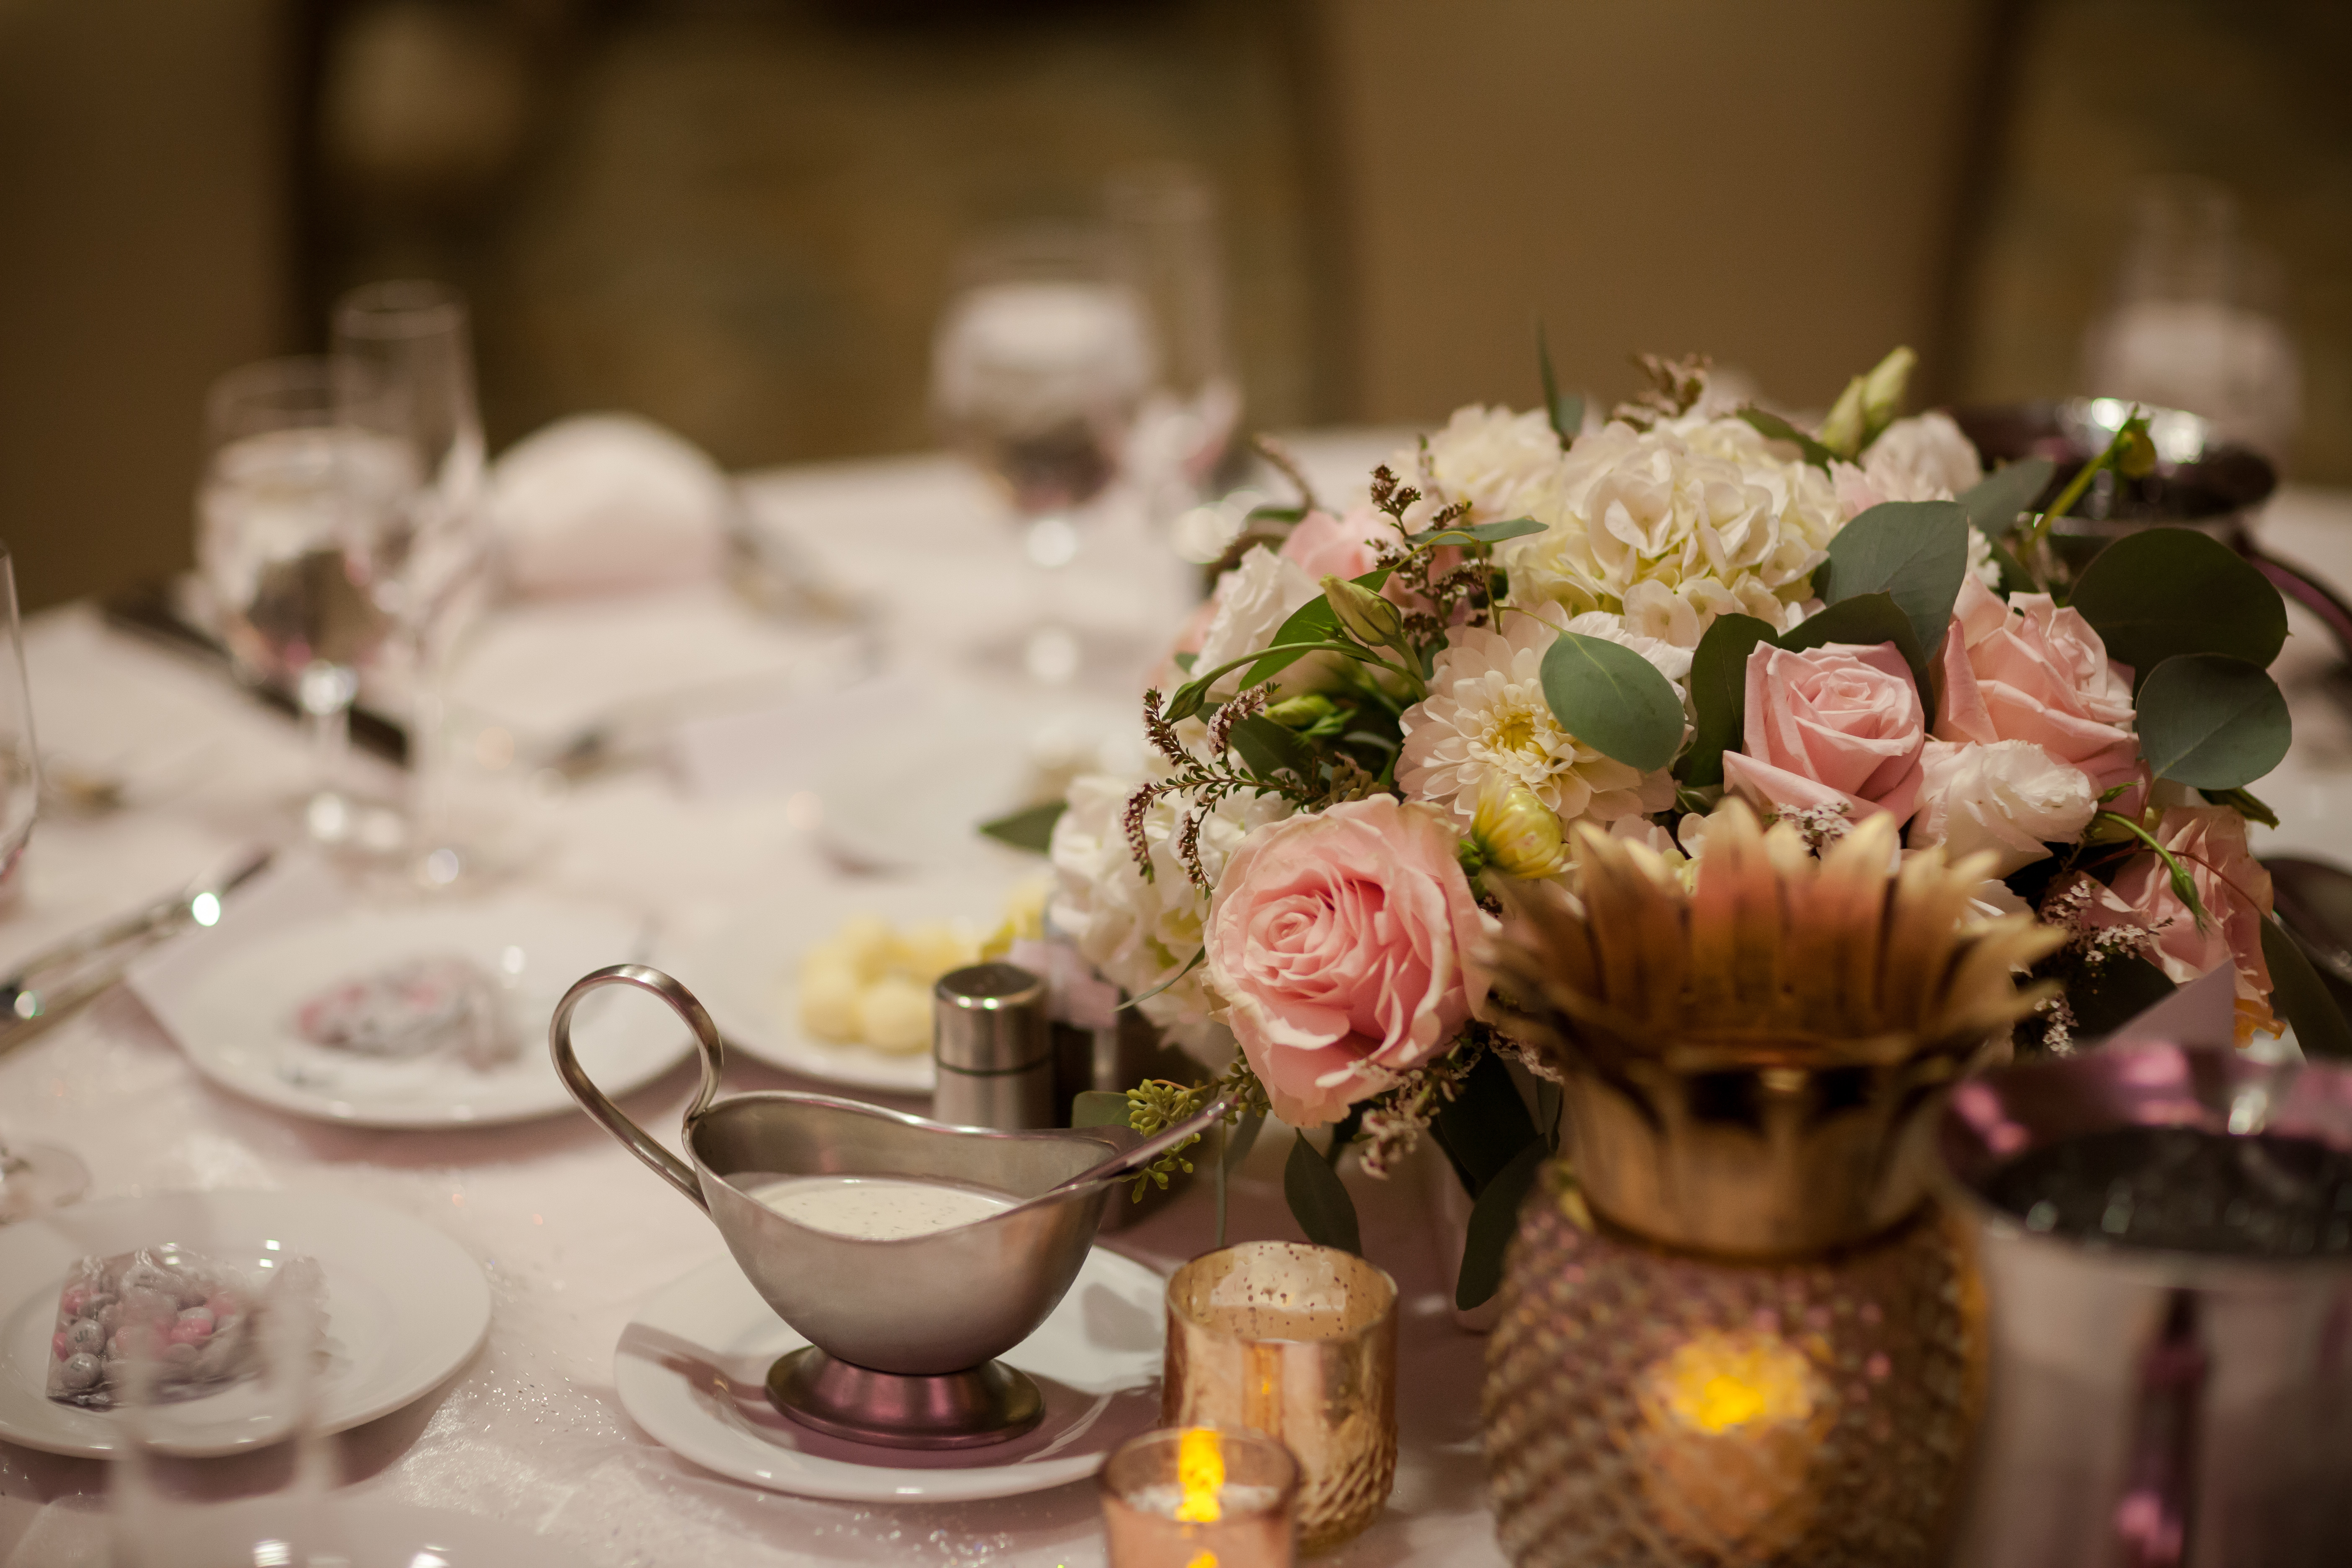 Table setup for a wedding reception